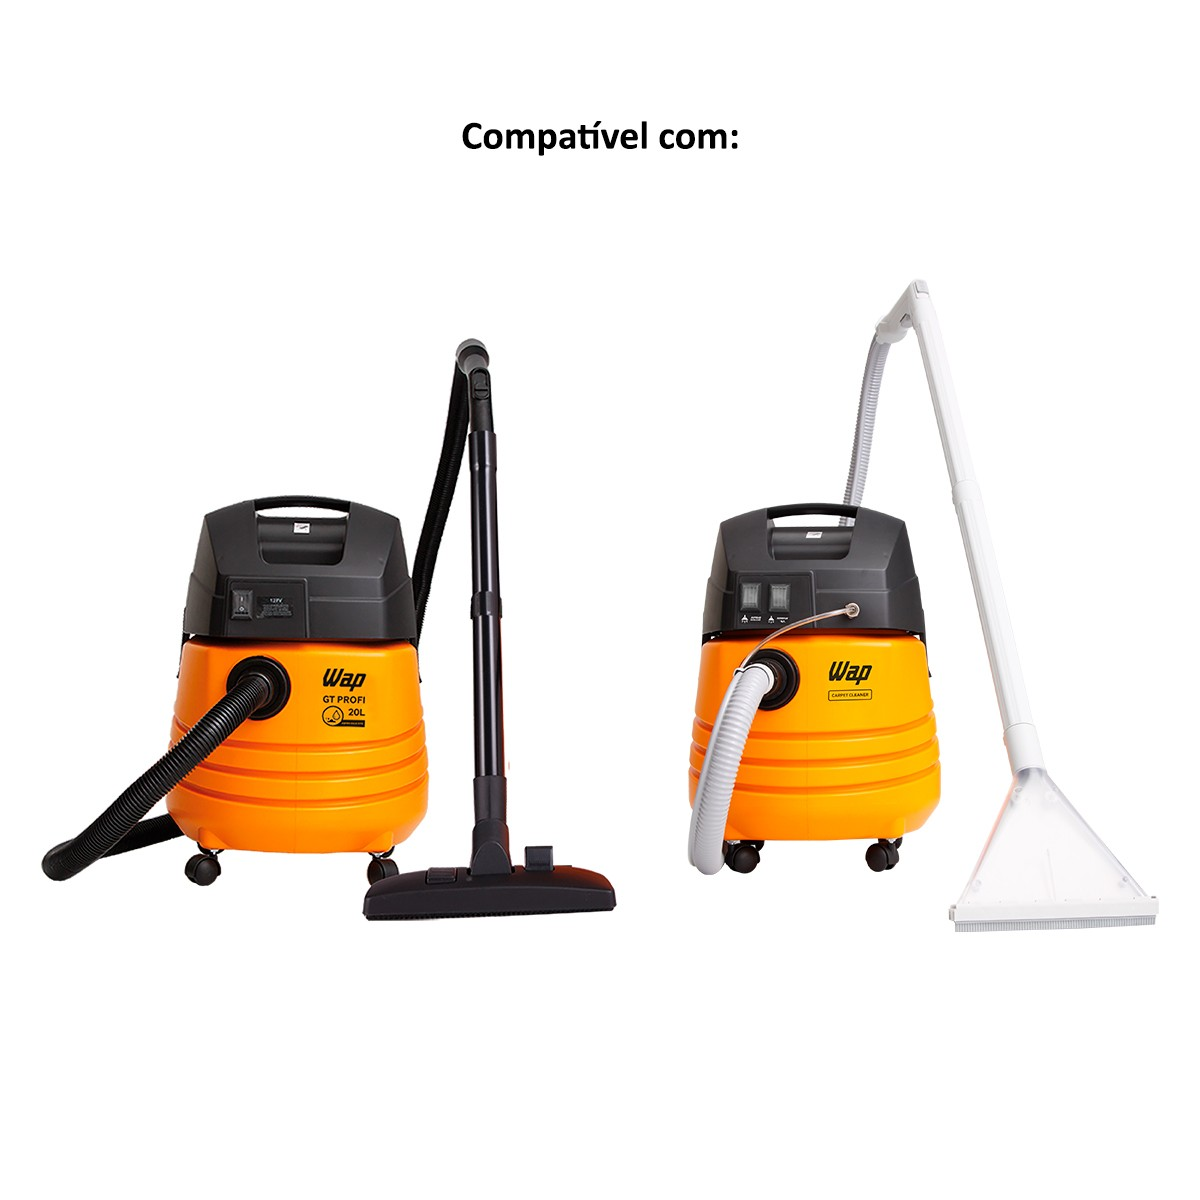 Kit Gaiola e Boia para Aspirador Wap GT Profi, Turbo 25, Turbo 1600, Gt, Gt Prof 20, Turbo 2002 e Extratora Carpet Cleaner